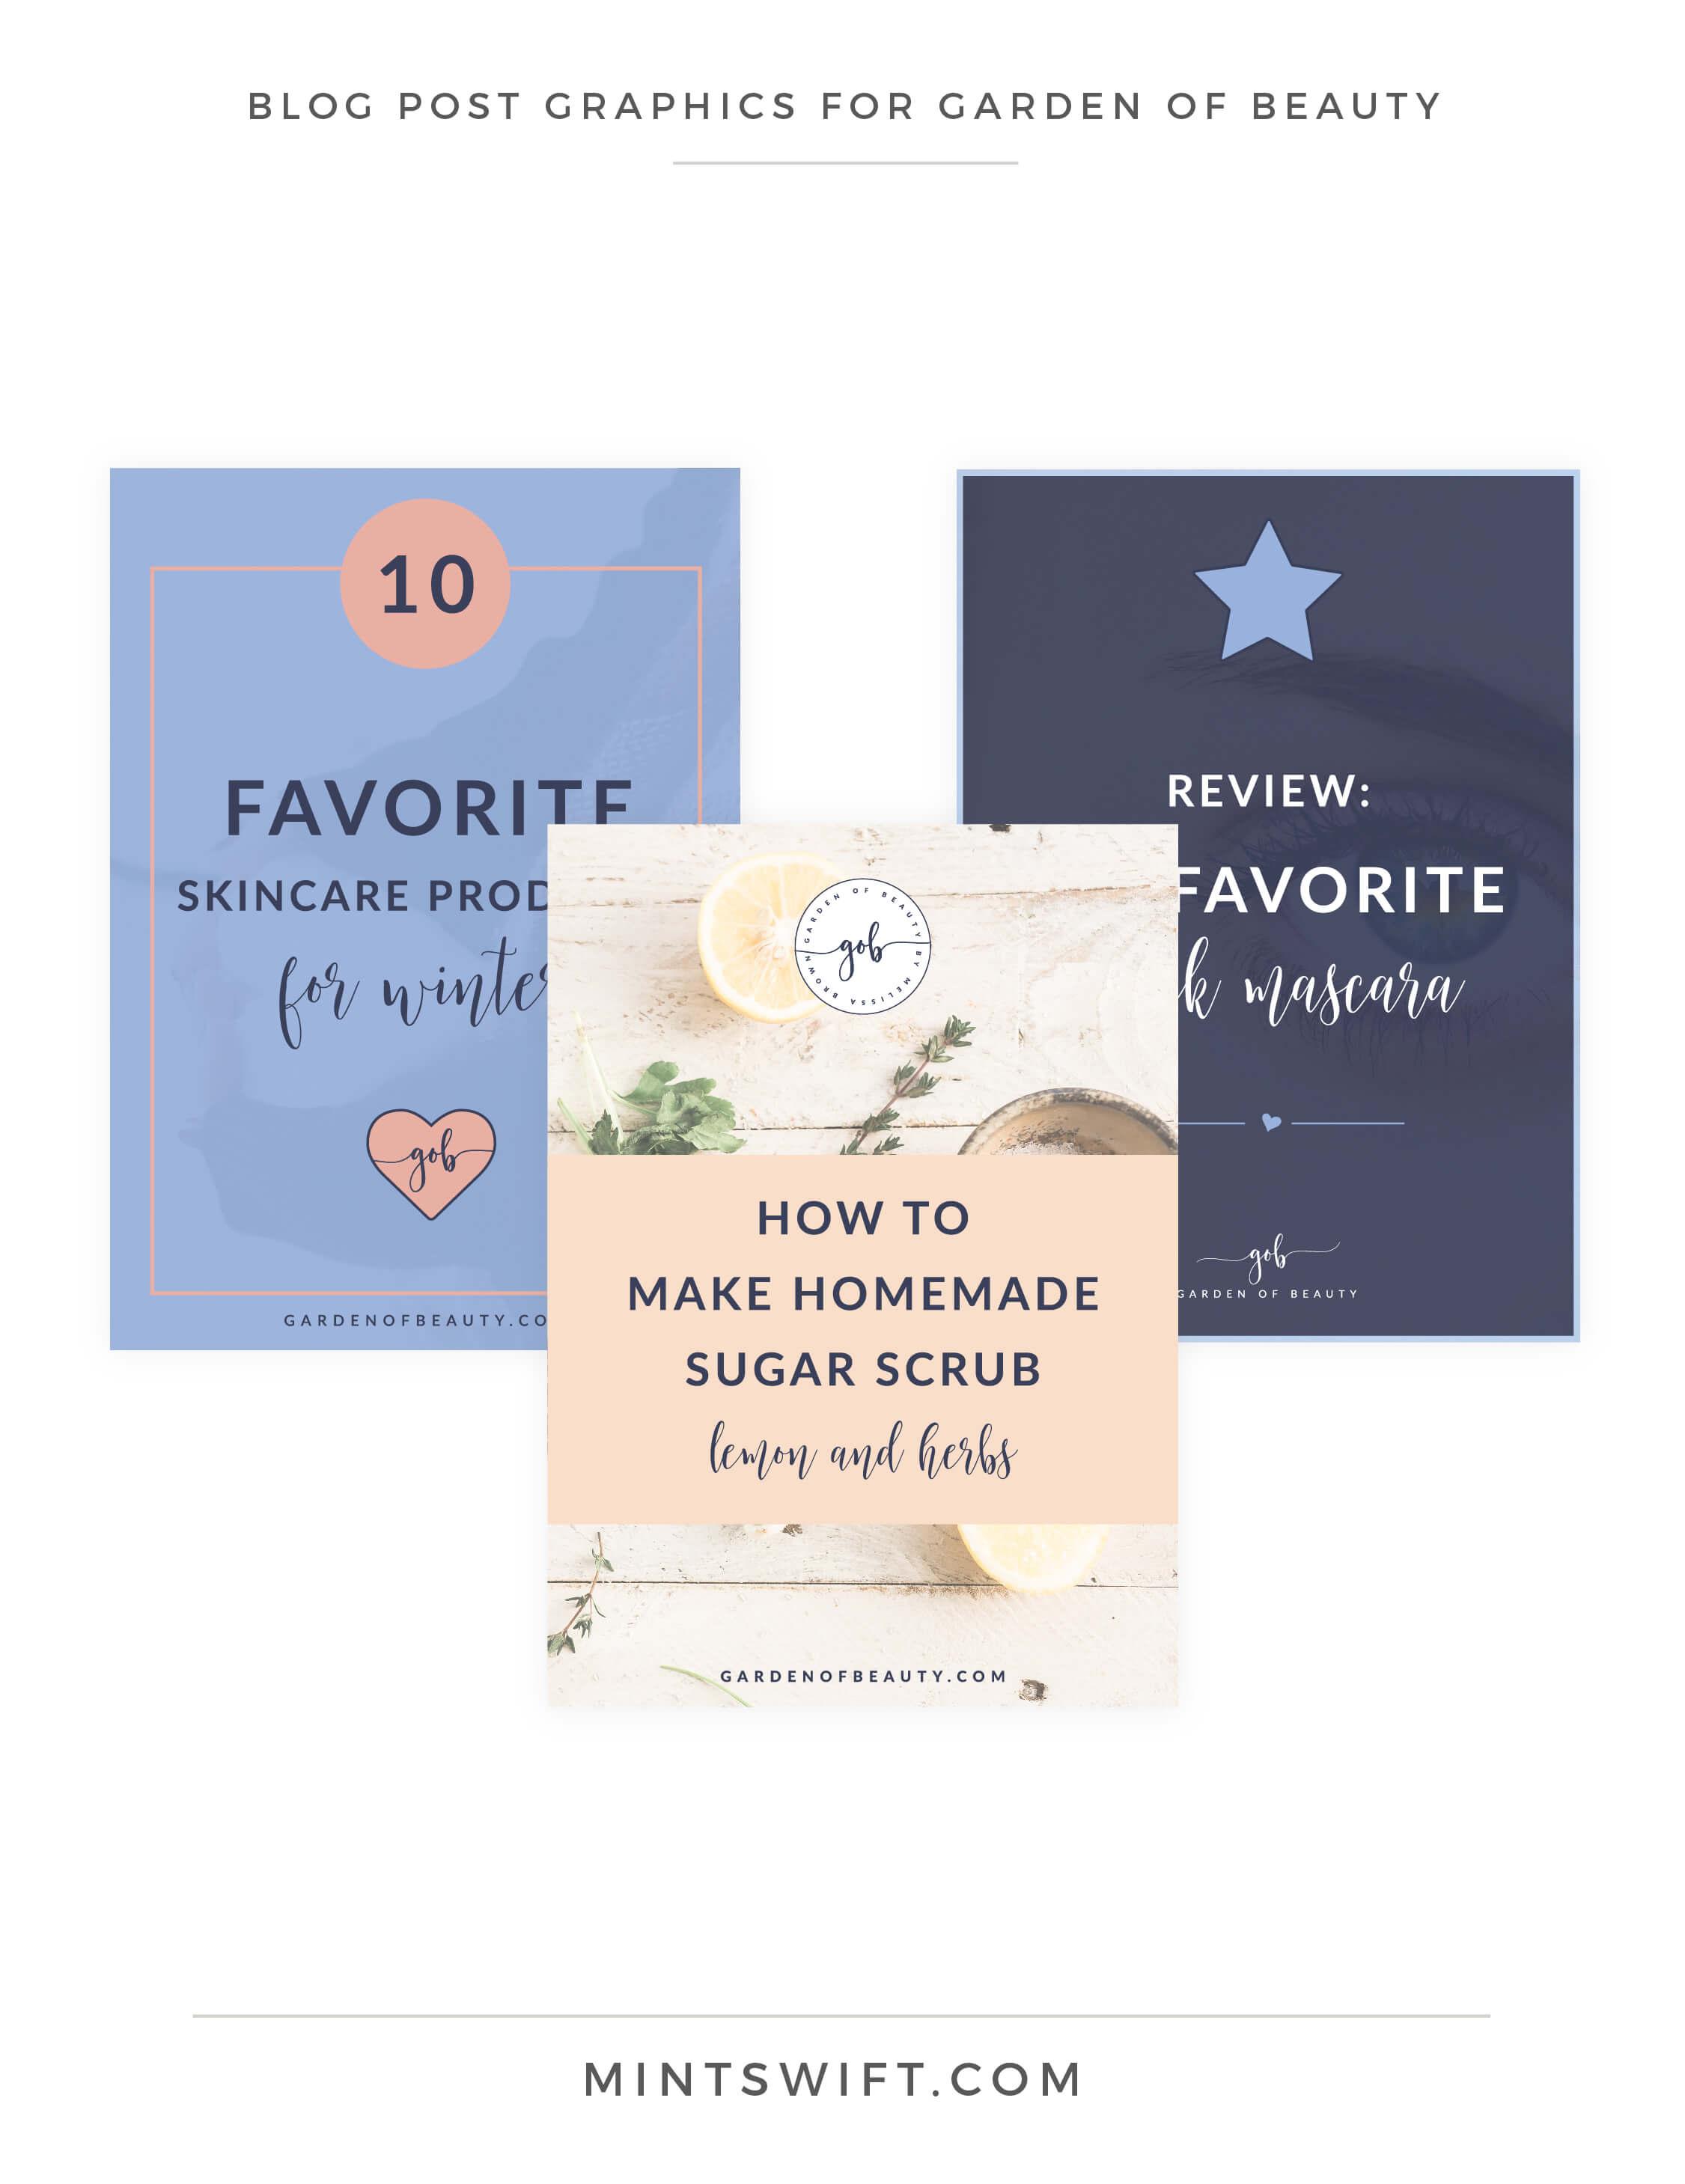 Garden of Beauty - Blog Post Graphics - Brand Design Package - MintSwift